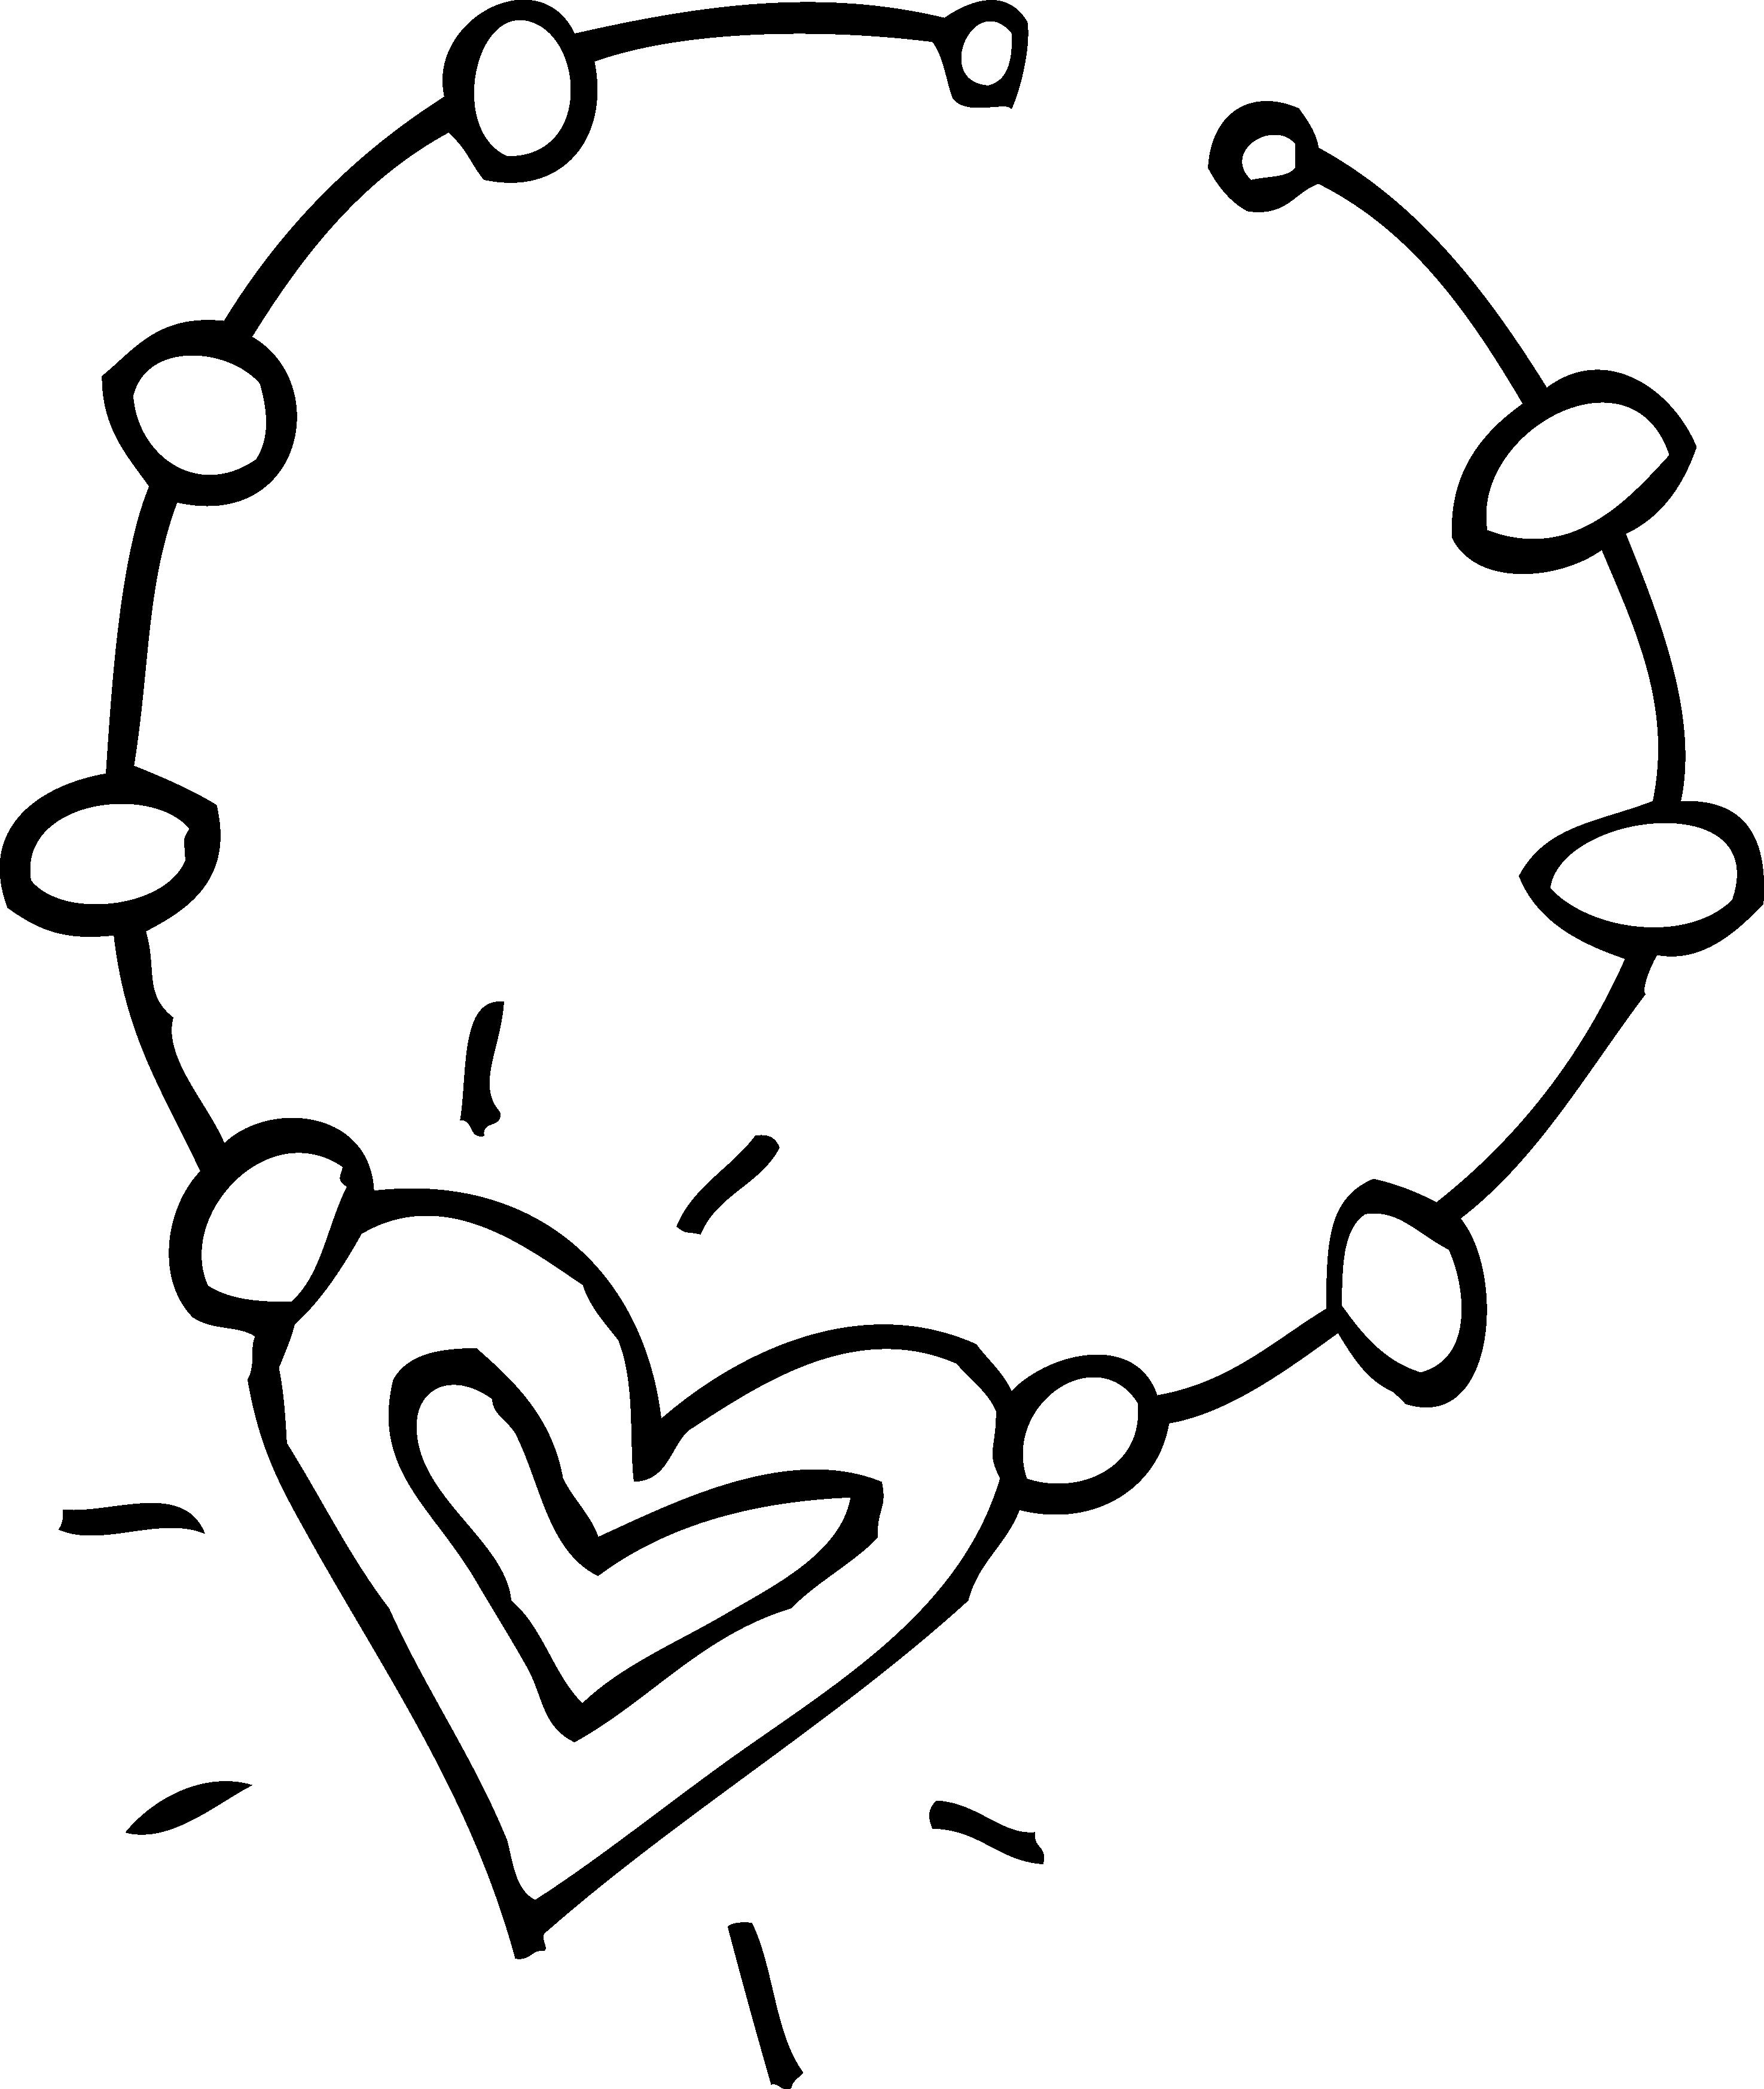 Diamond clipart pile diamond. Heart necklace free download